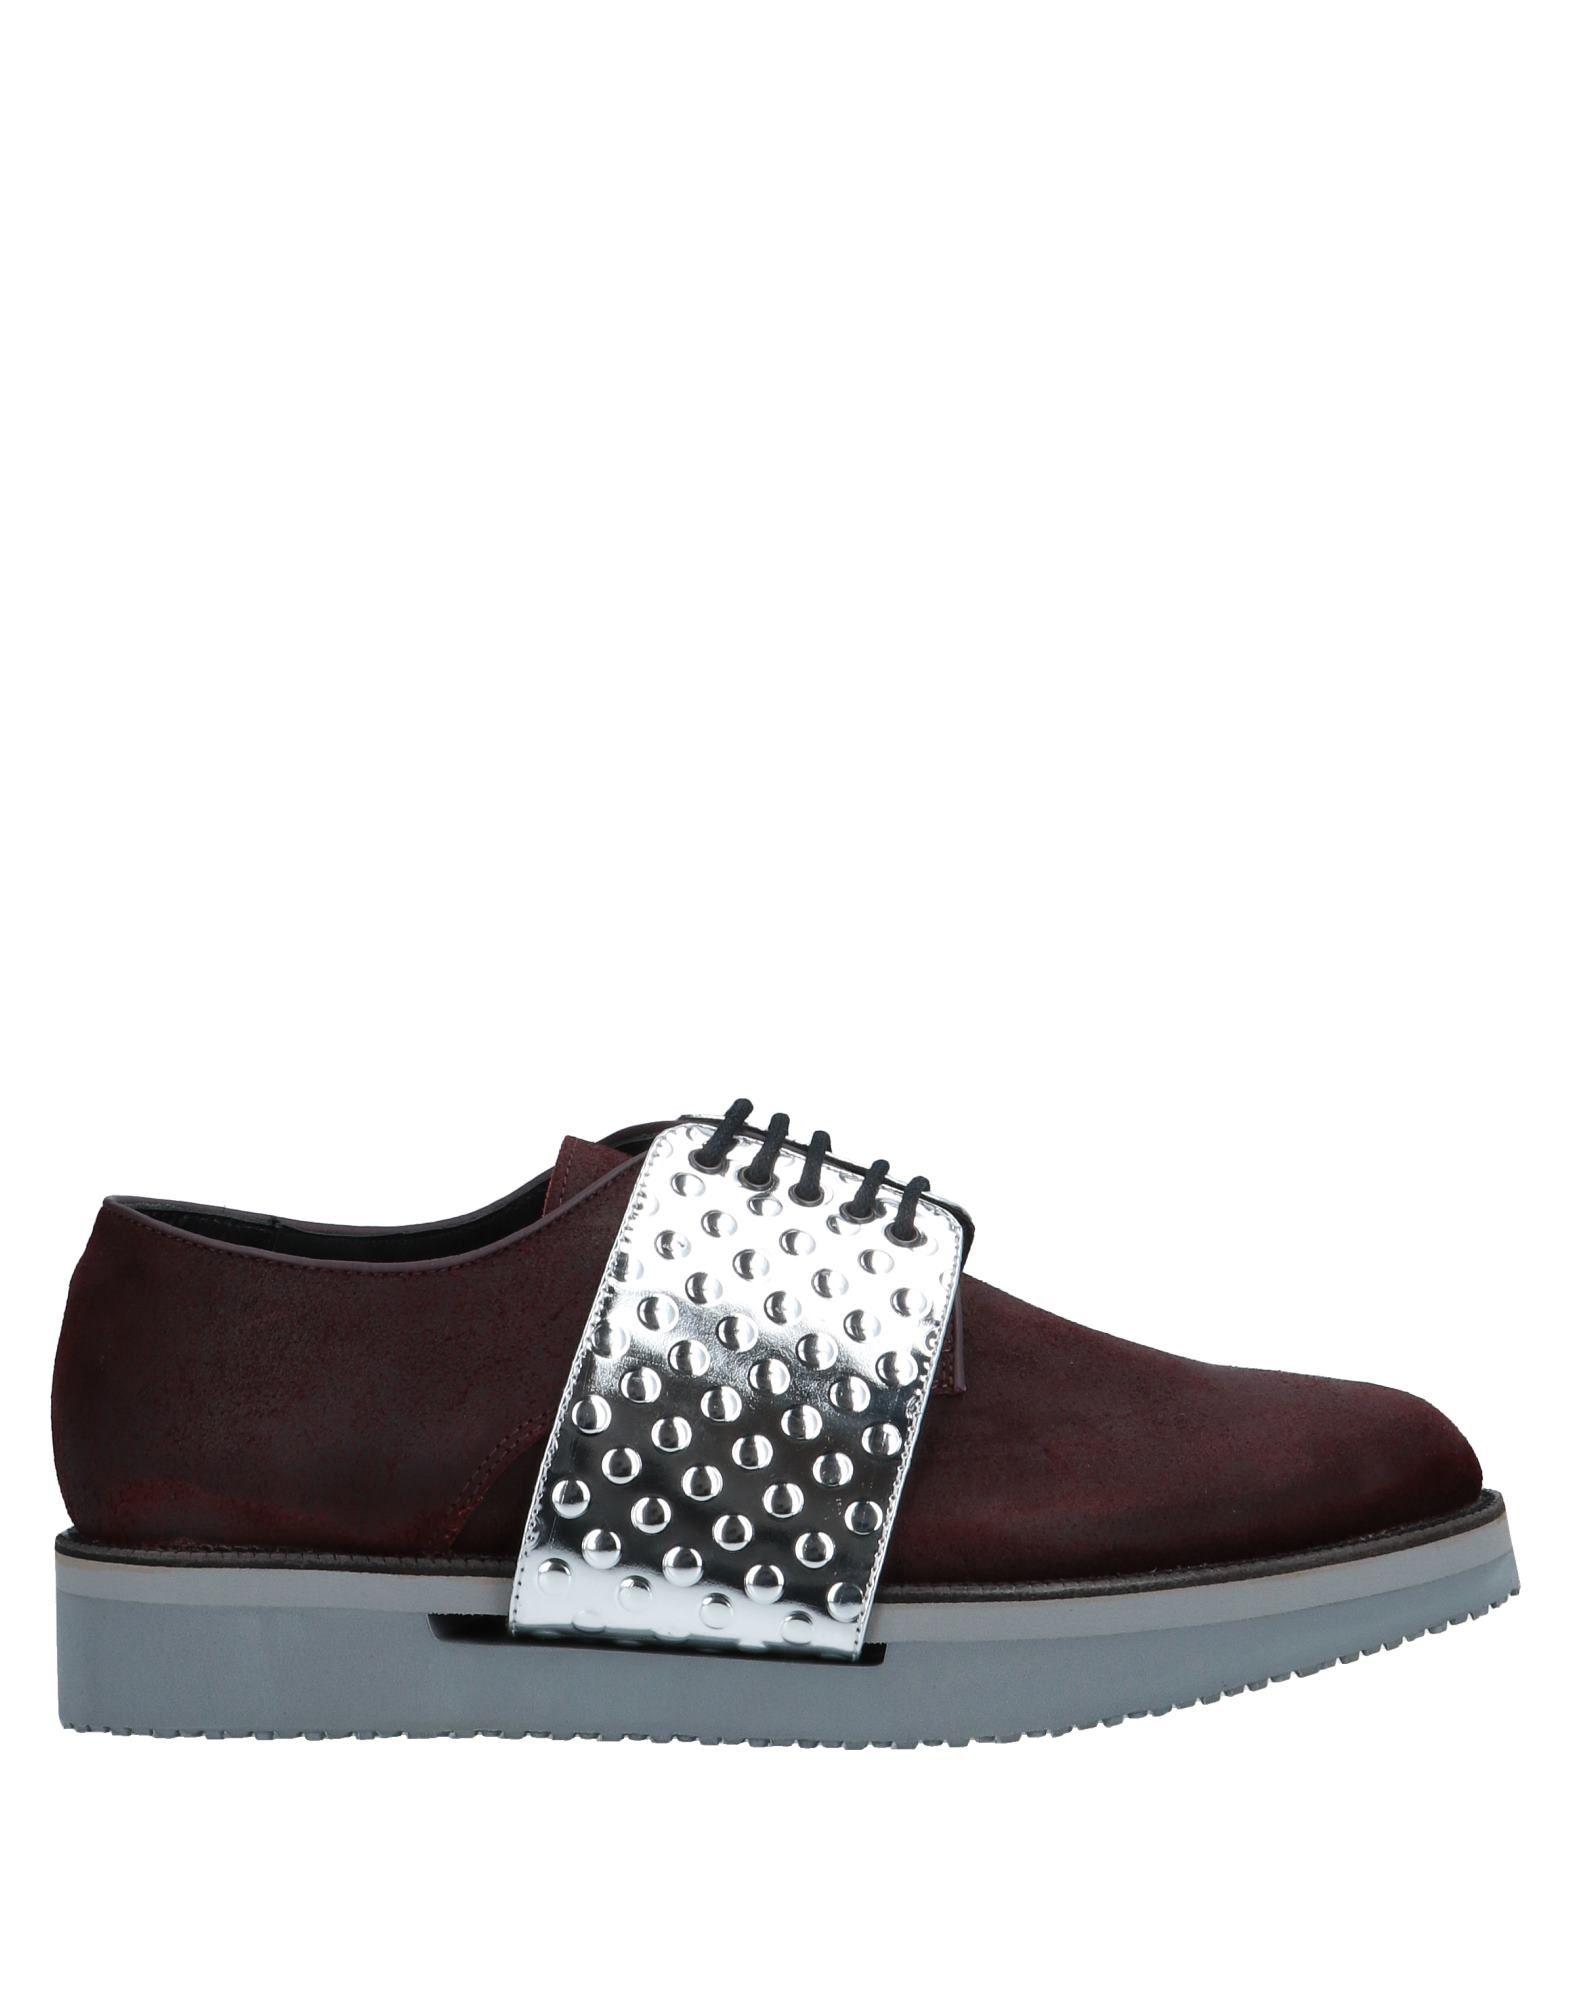 все цены на DIRK BIKKEMBERGS Обувь на шнурках онлайн